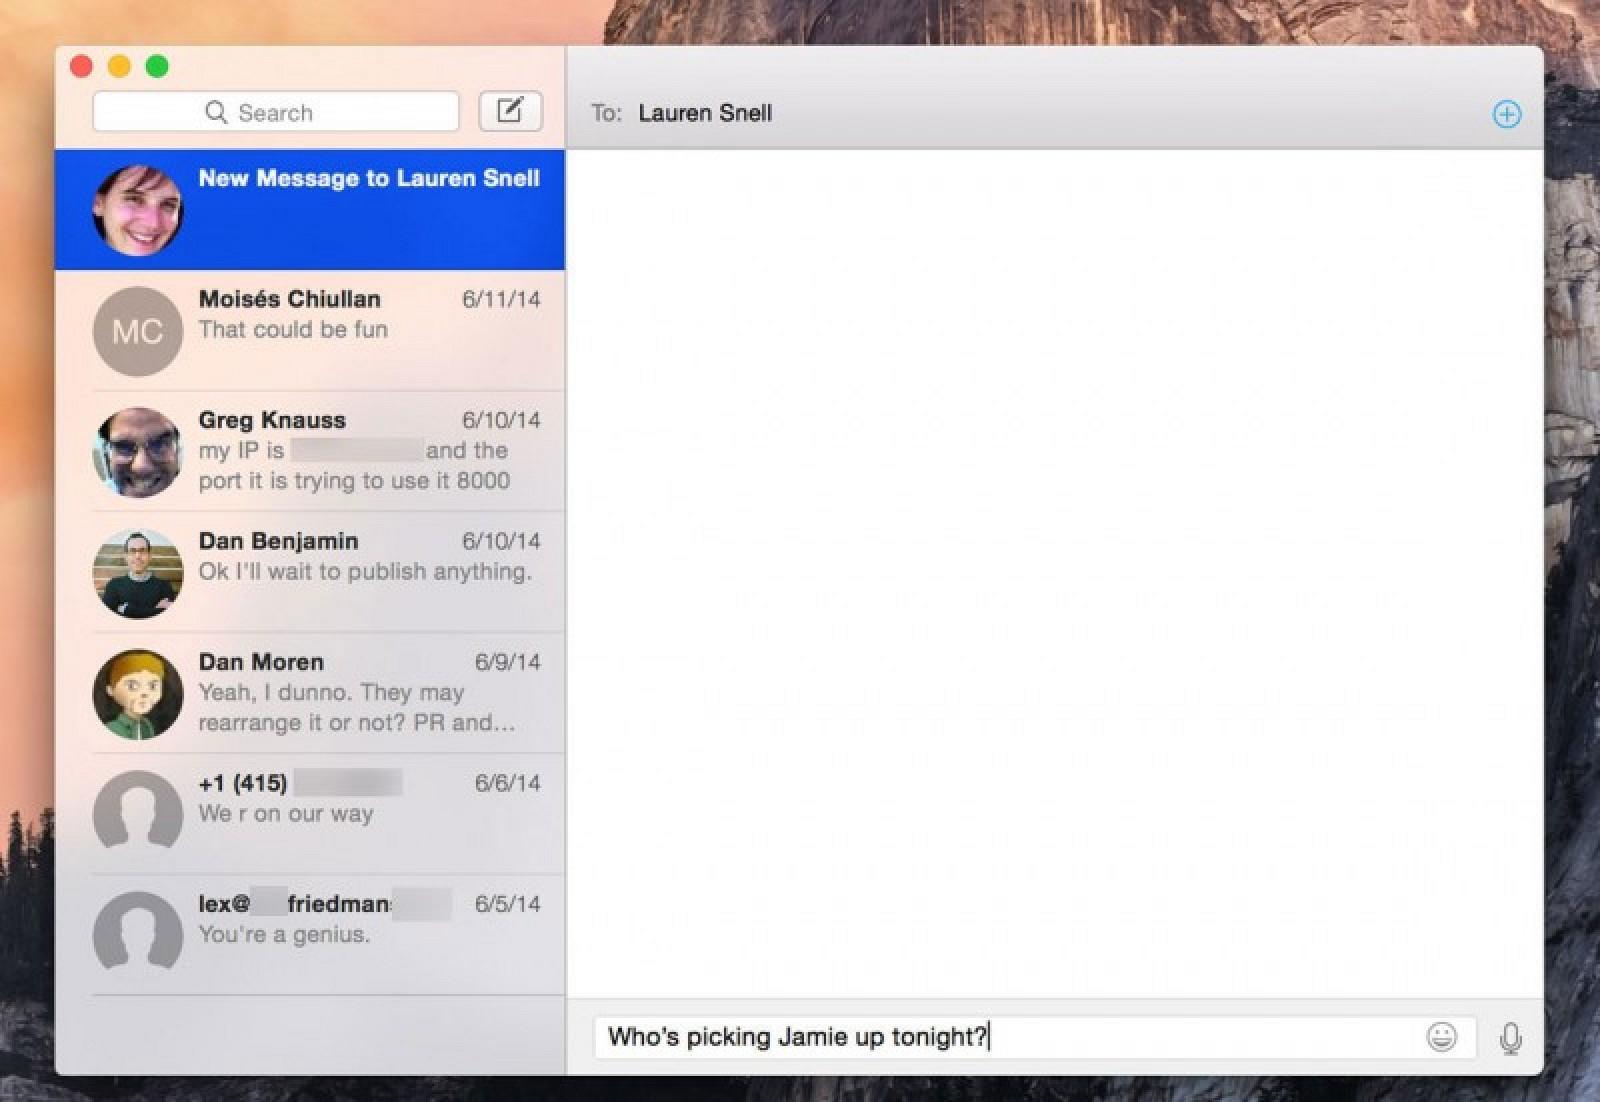 os x yosemite designed for retina screens  mac rumors apple ipod shuffle user guide apple ipad mini user guide download